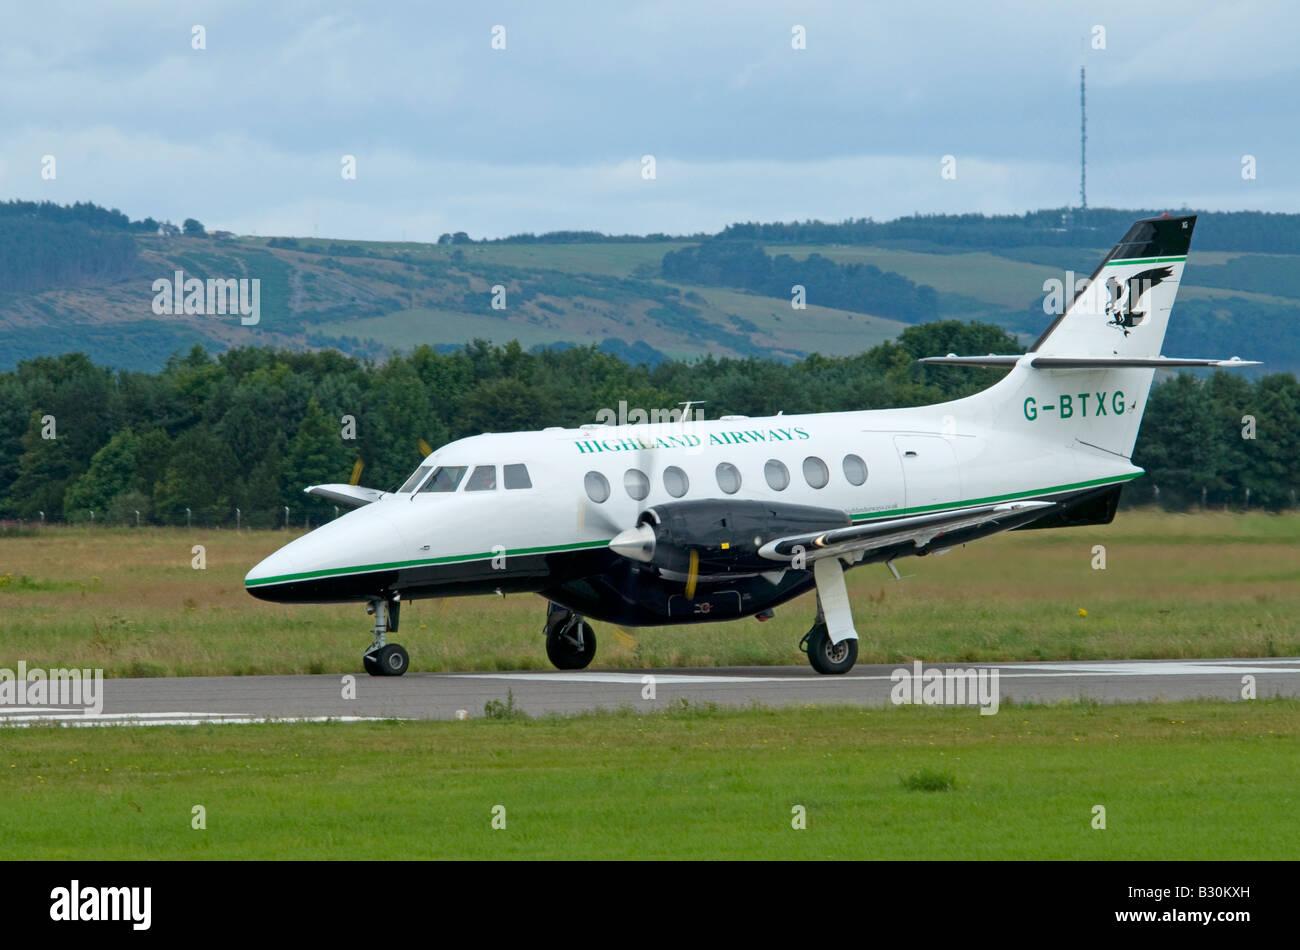 BAe Jetstream 3102 arriving at Inverness Airport Highland Region Scotland - Stock Image